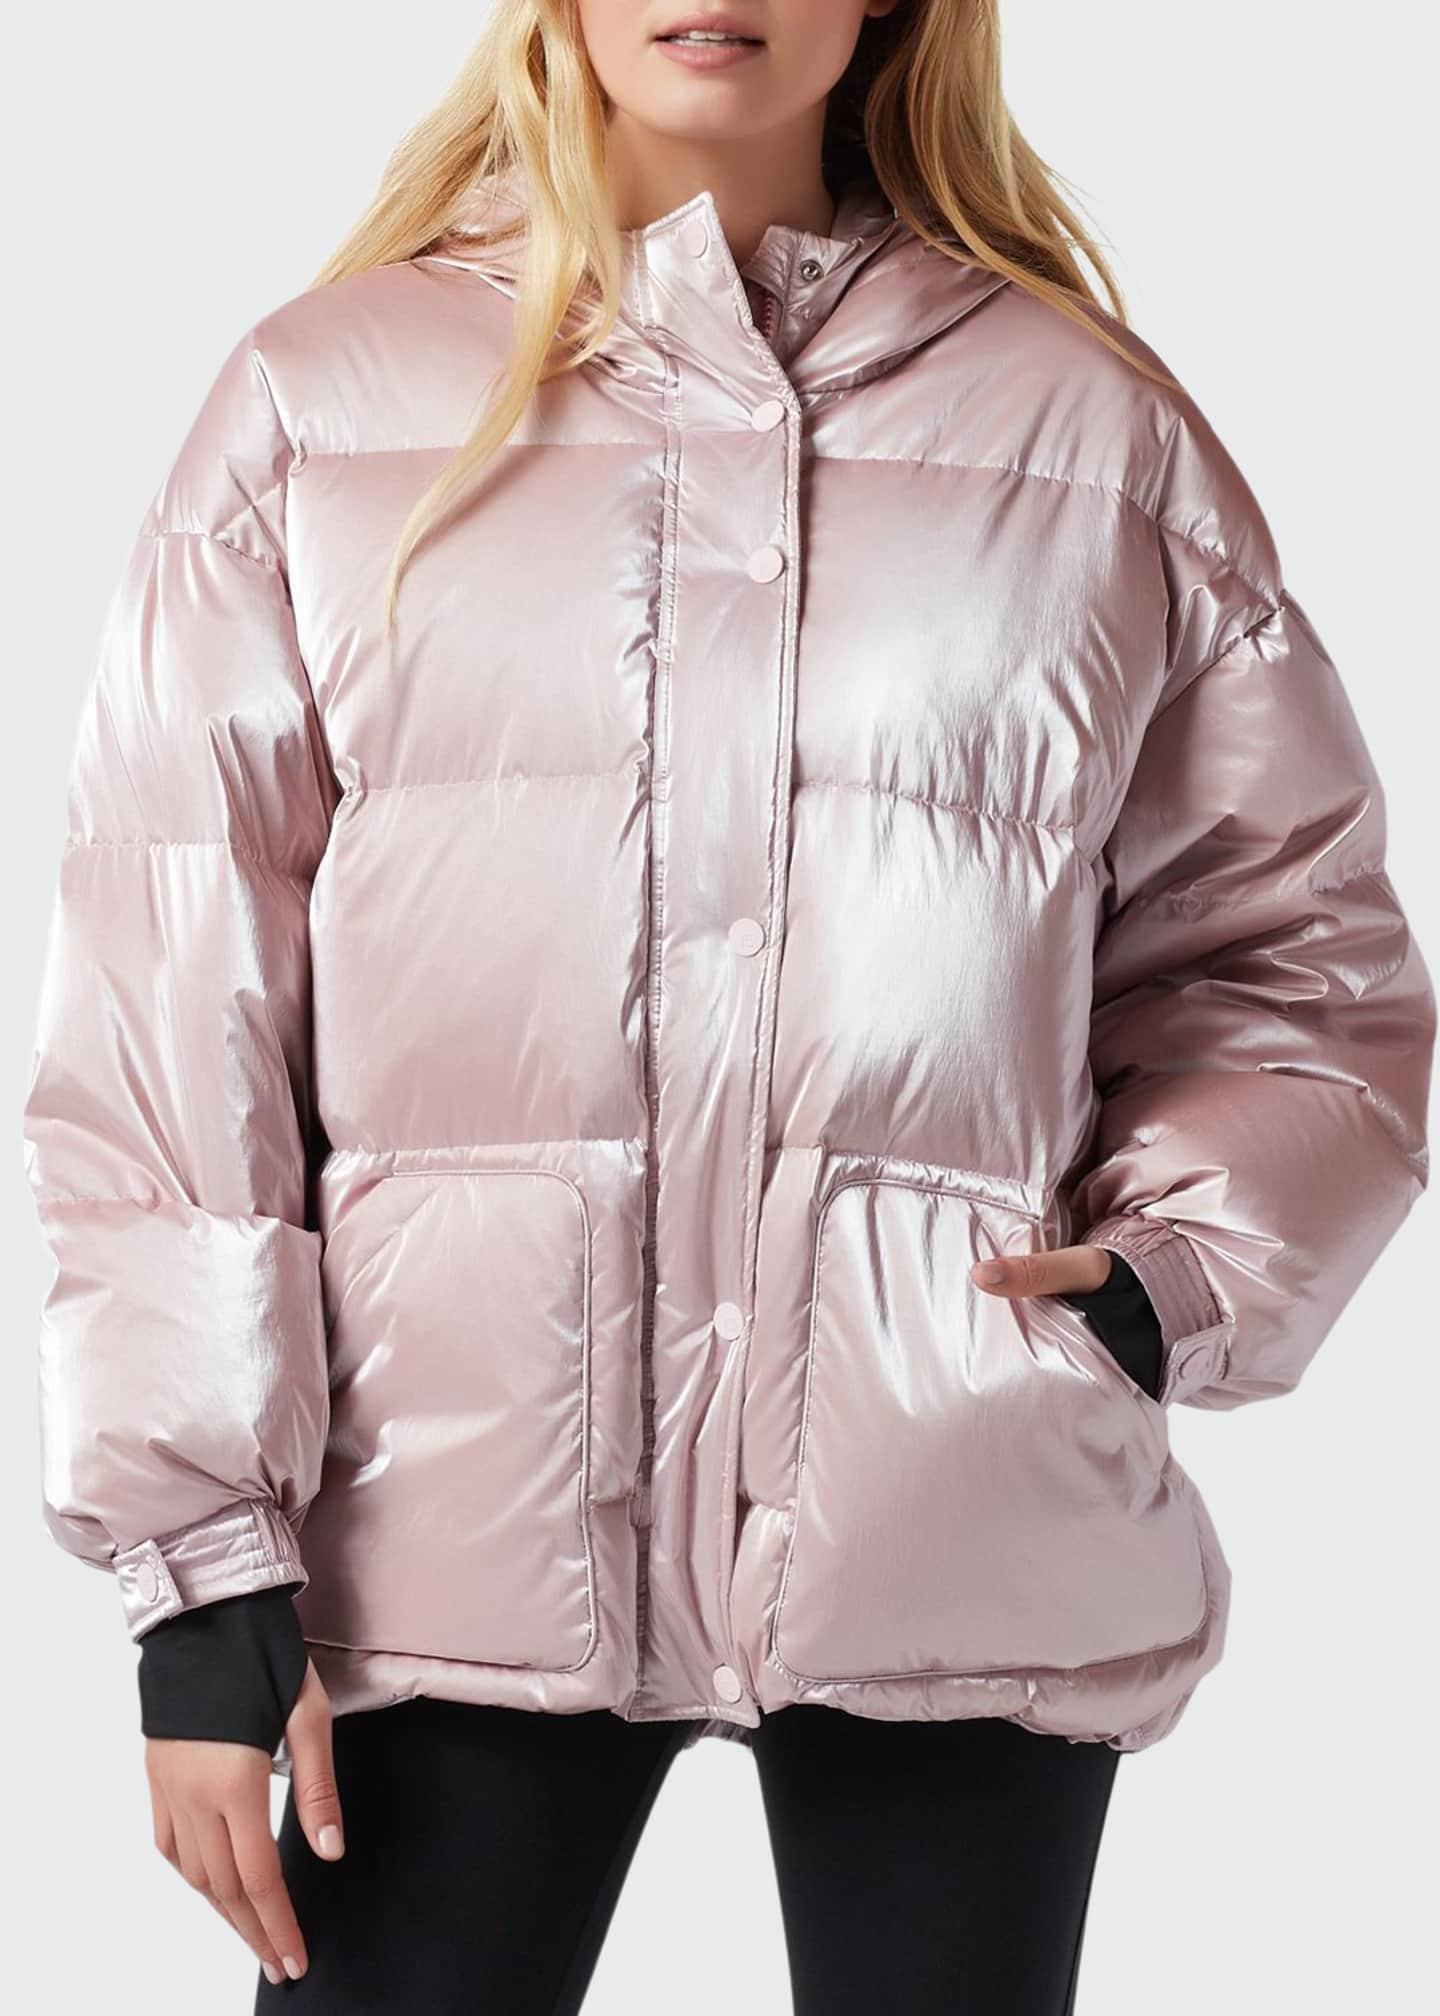 Blanc Noir Cortina Hooded Puffer Jacket